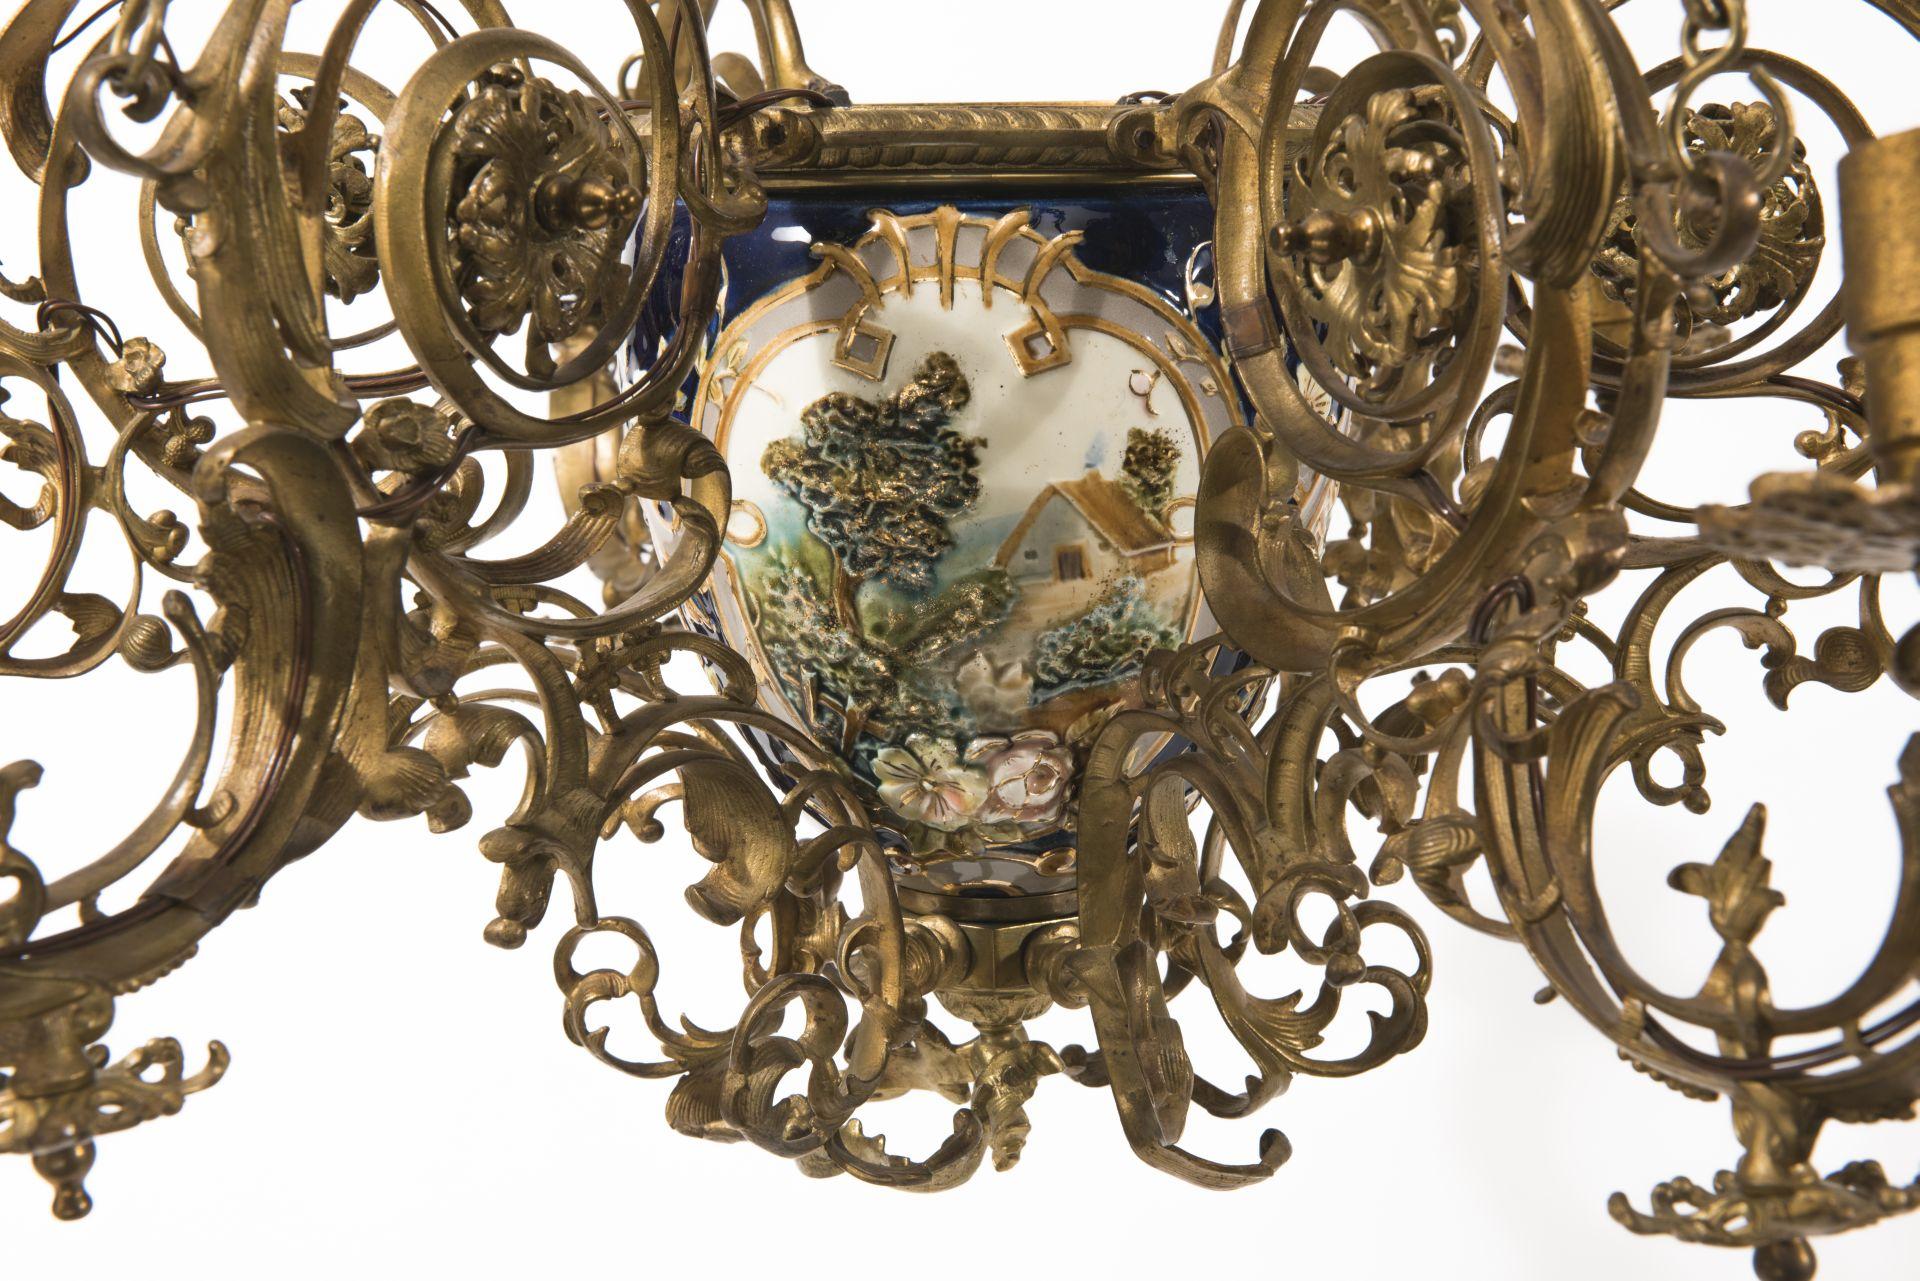 Fragment of chandelier, 1887–1919, National Museum of Lithuania, KR-73. Photo by Kęstutis Stoškus, 2017